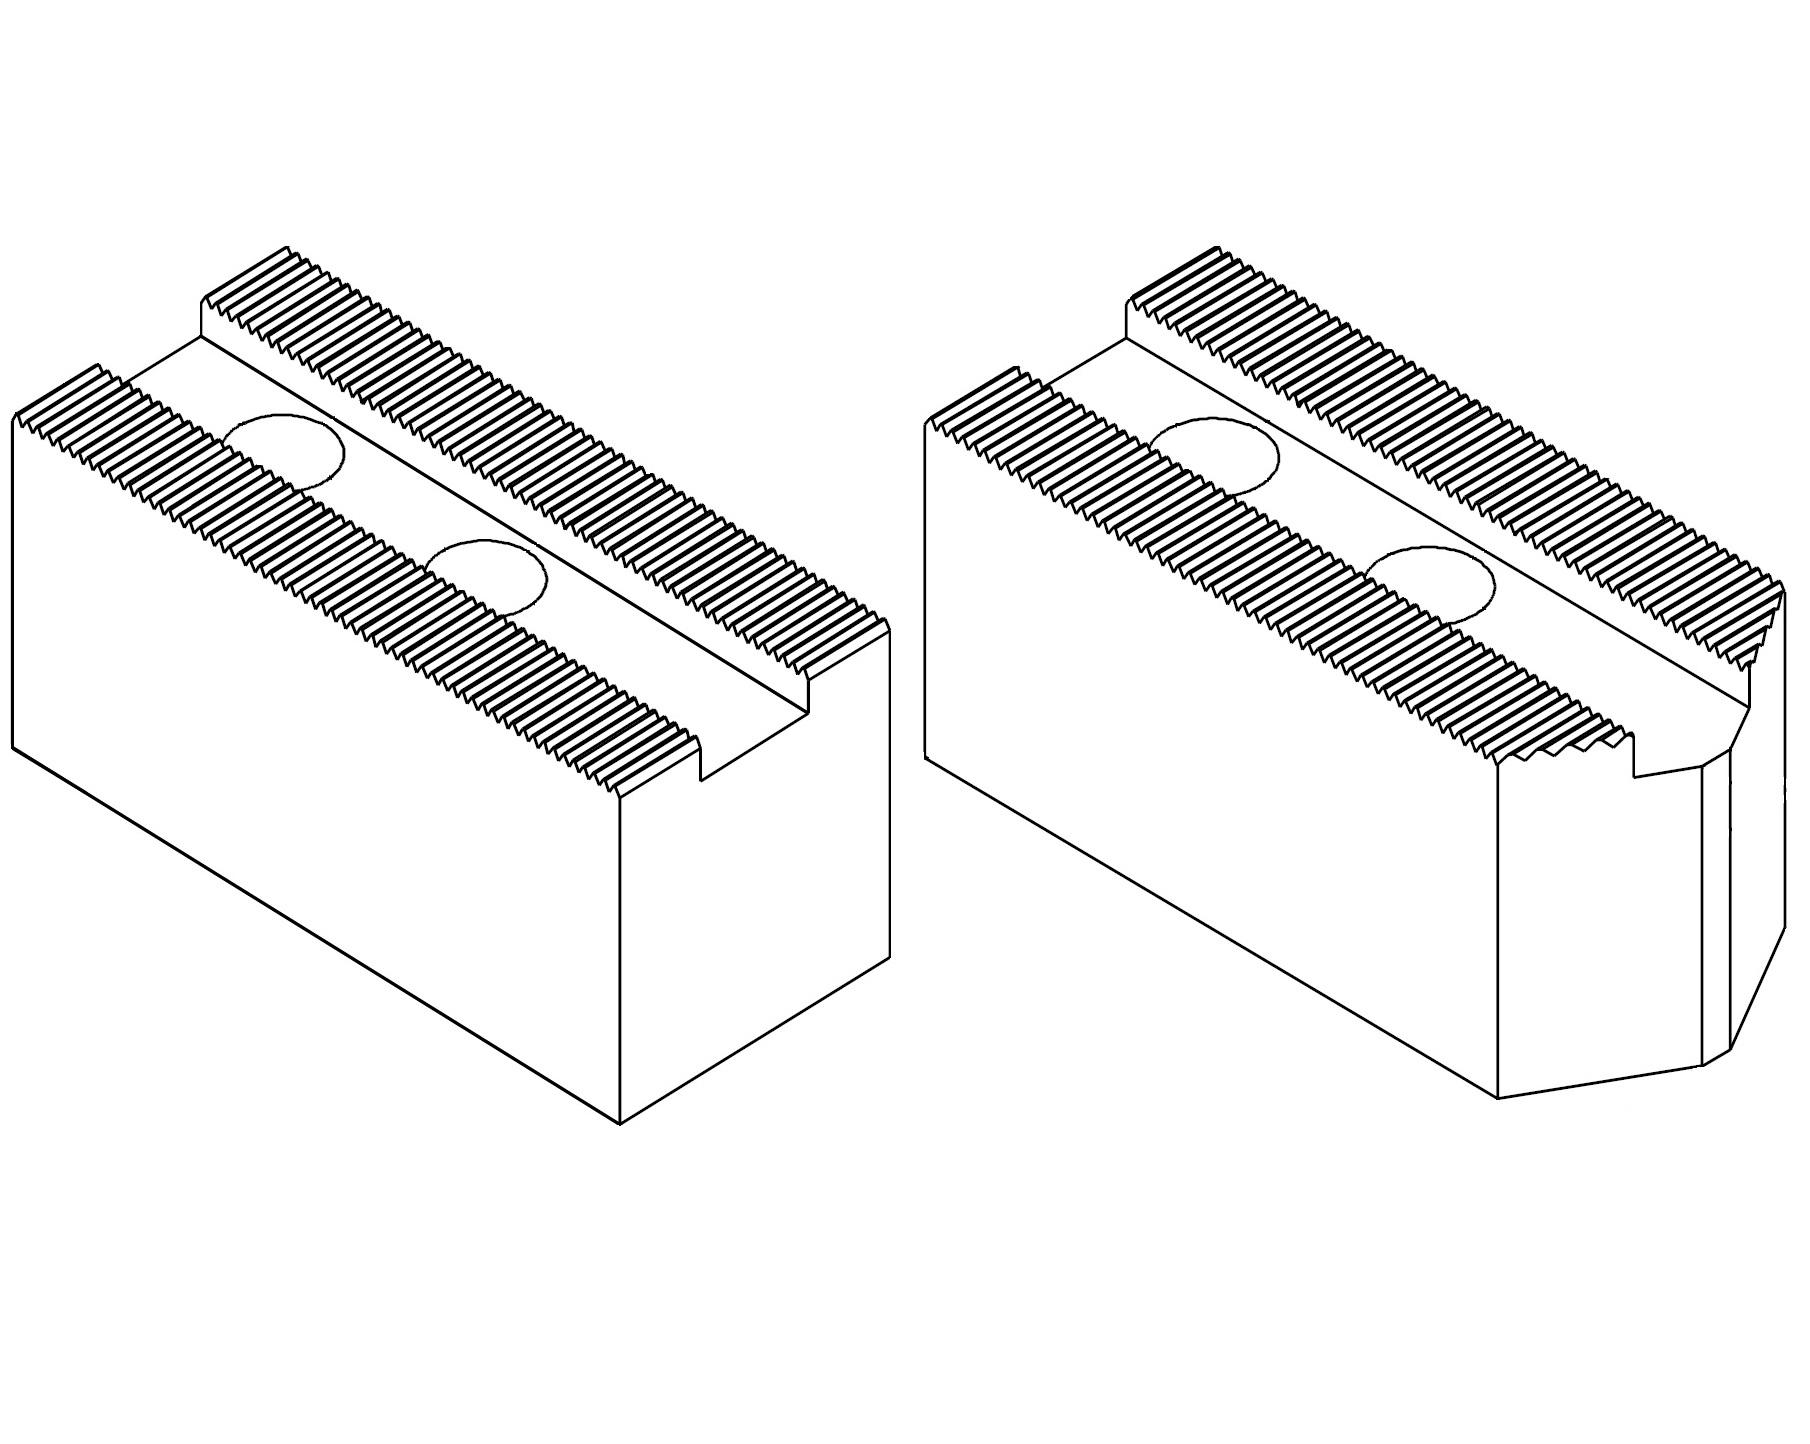 "Čelisti měkké 1/16""x90°, šířka drážky - 12 (sklíčidla pr. 125 - 200 mm)"